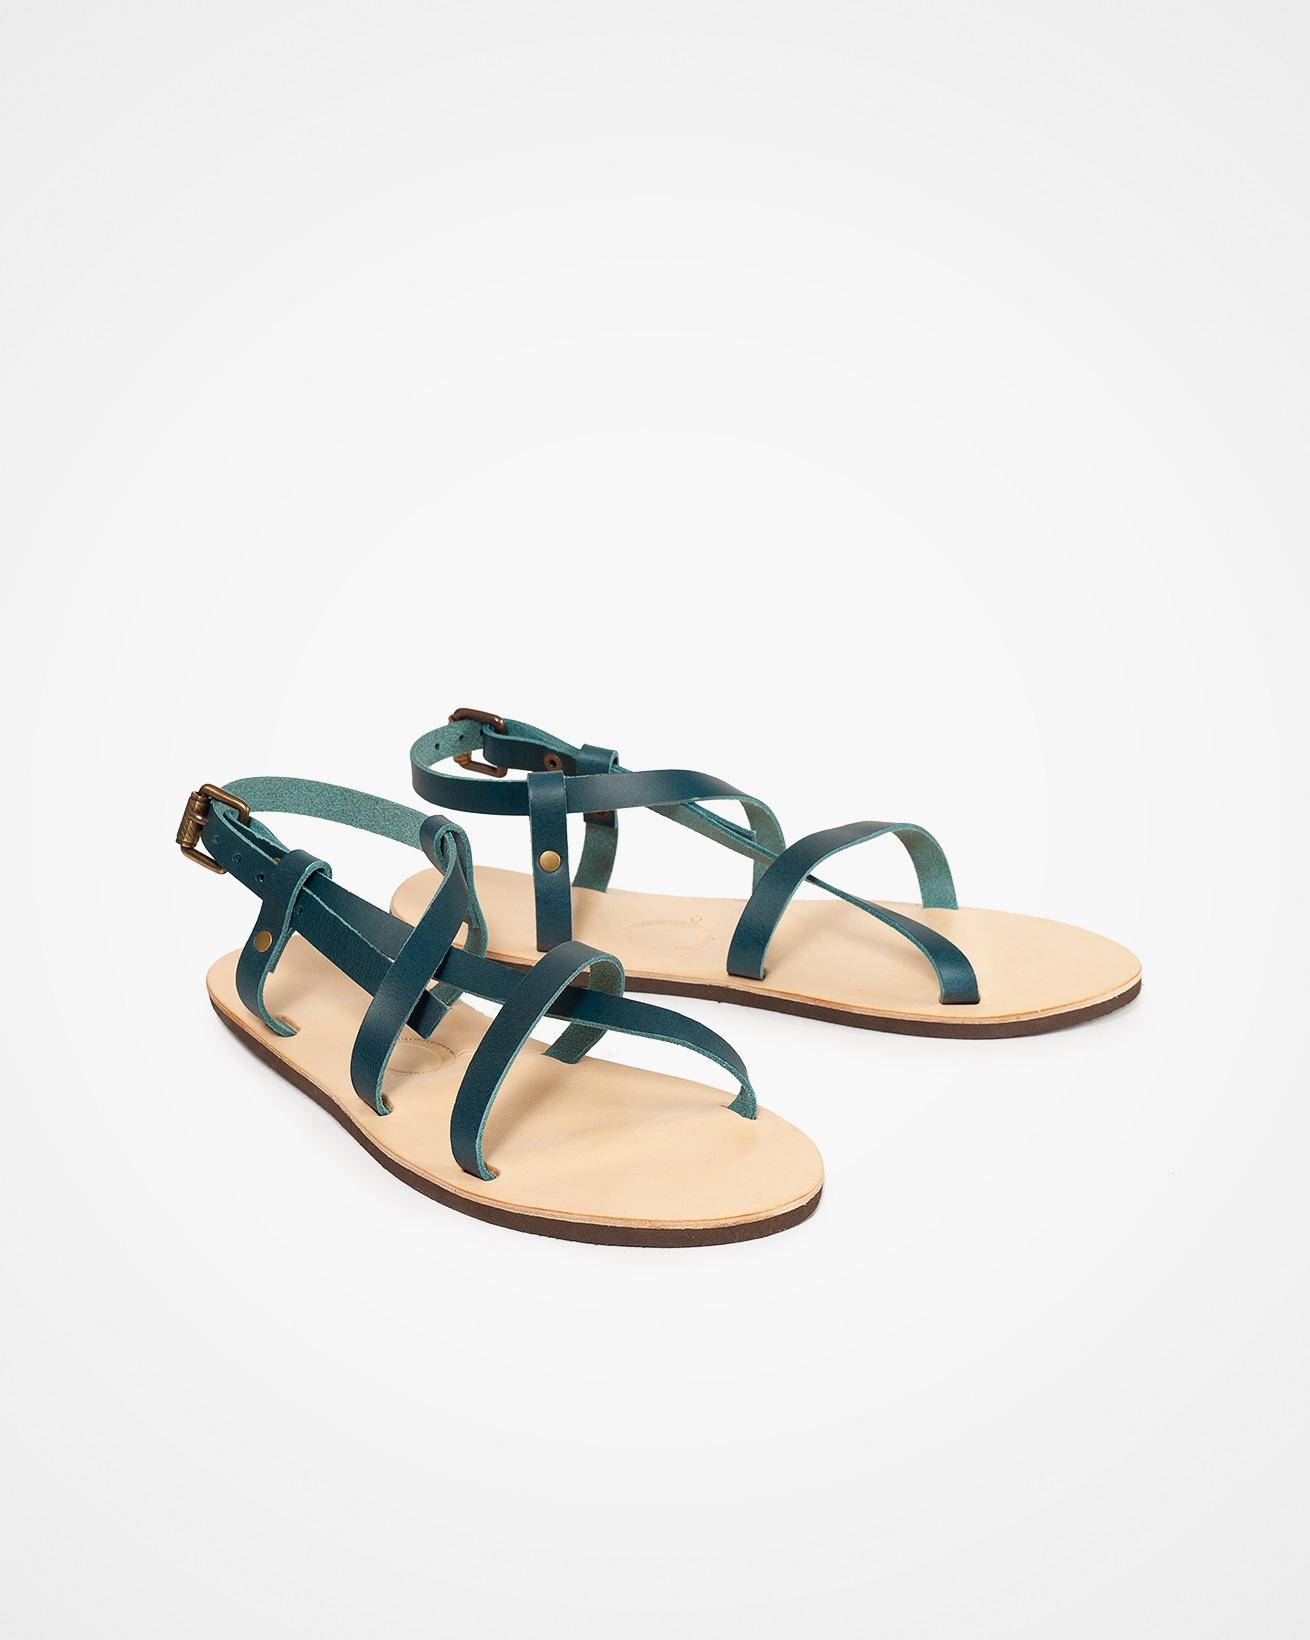 Open Toe Strappy Sandal - Icelandic Blue - Size 7 - 2486